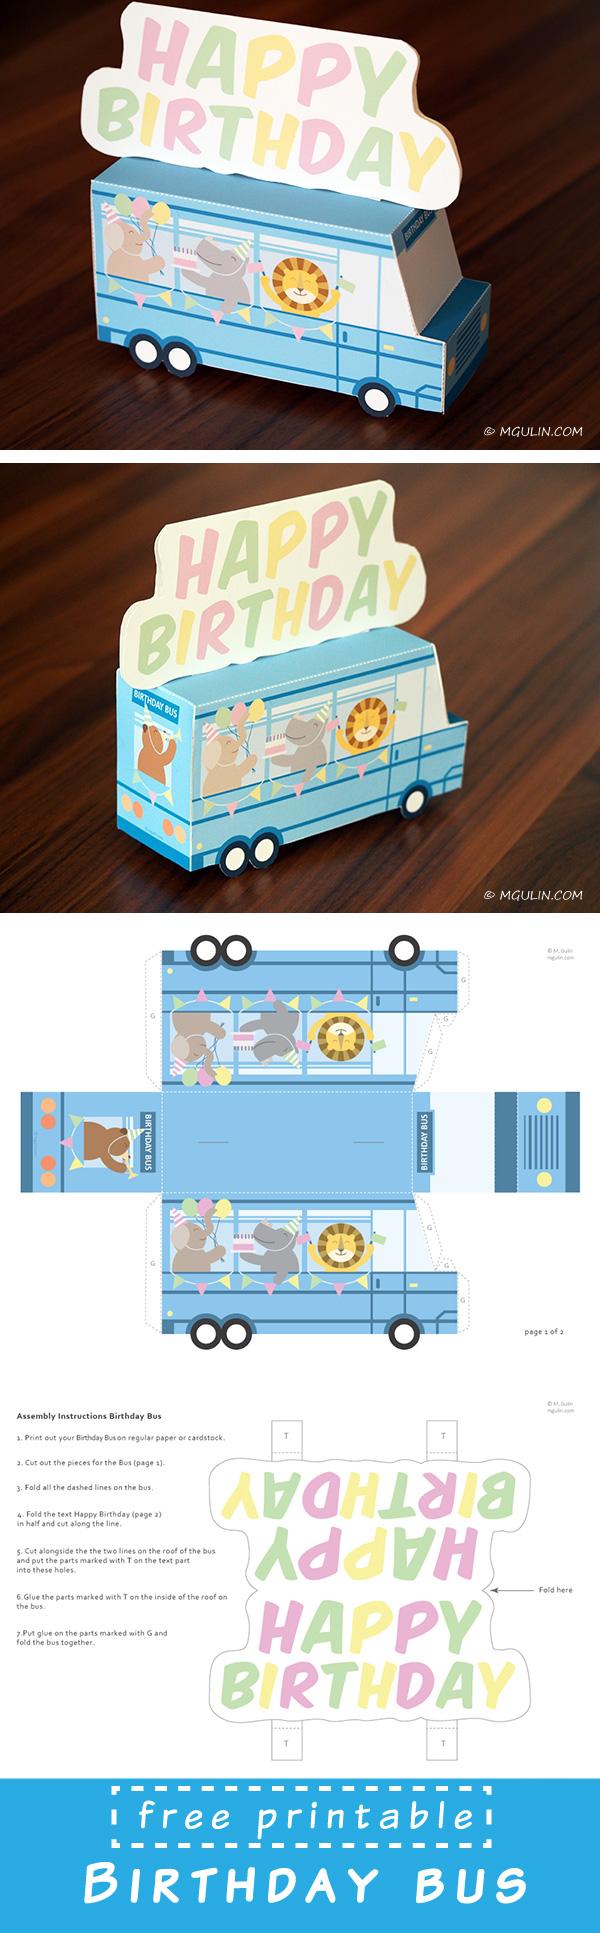 Printable birthday bus